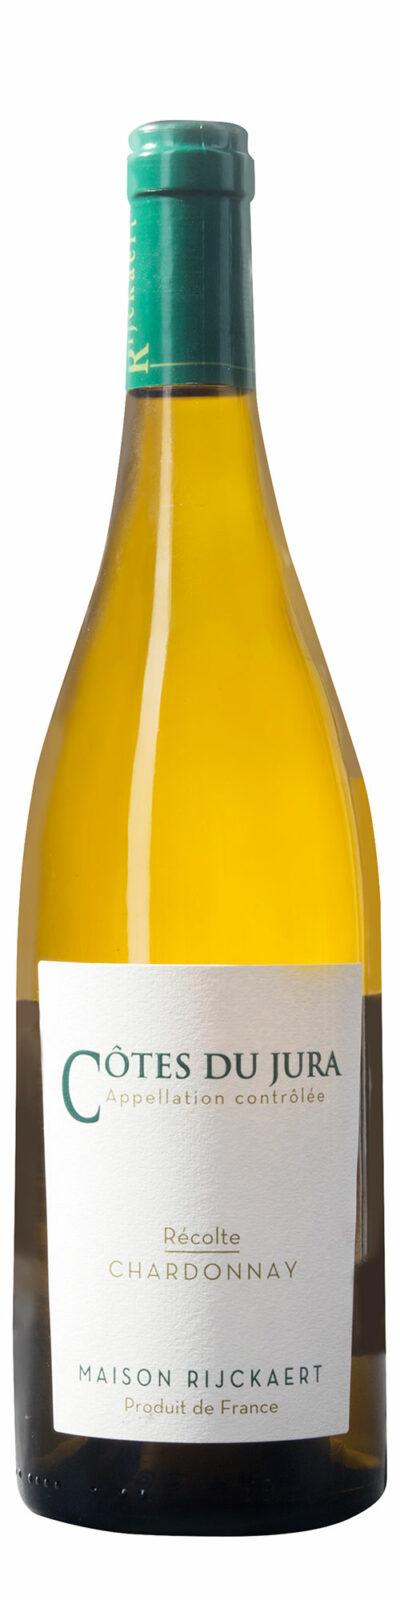 Côtes du Jura Chardonnay